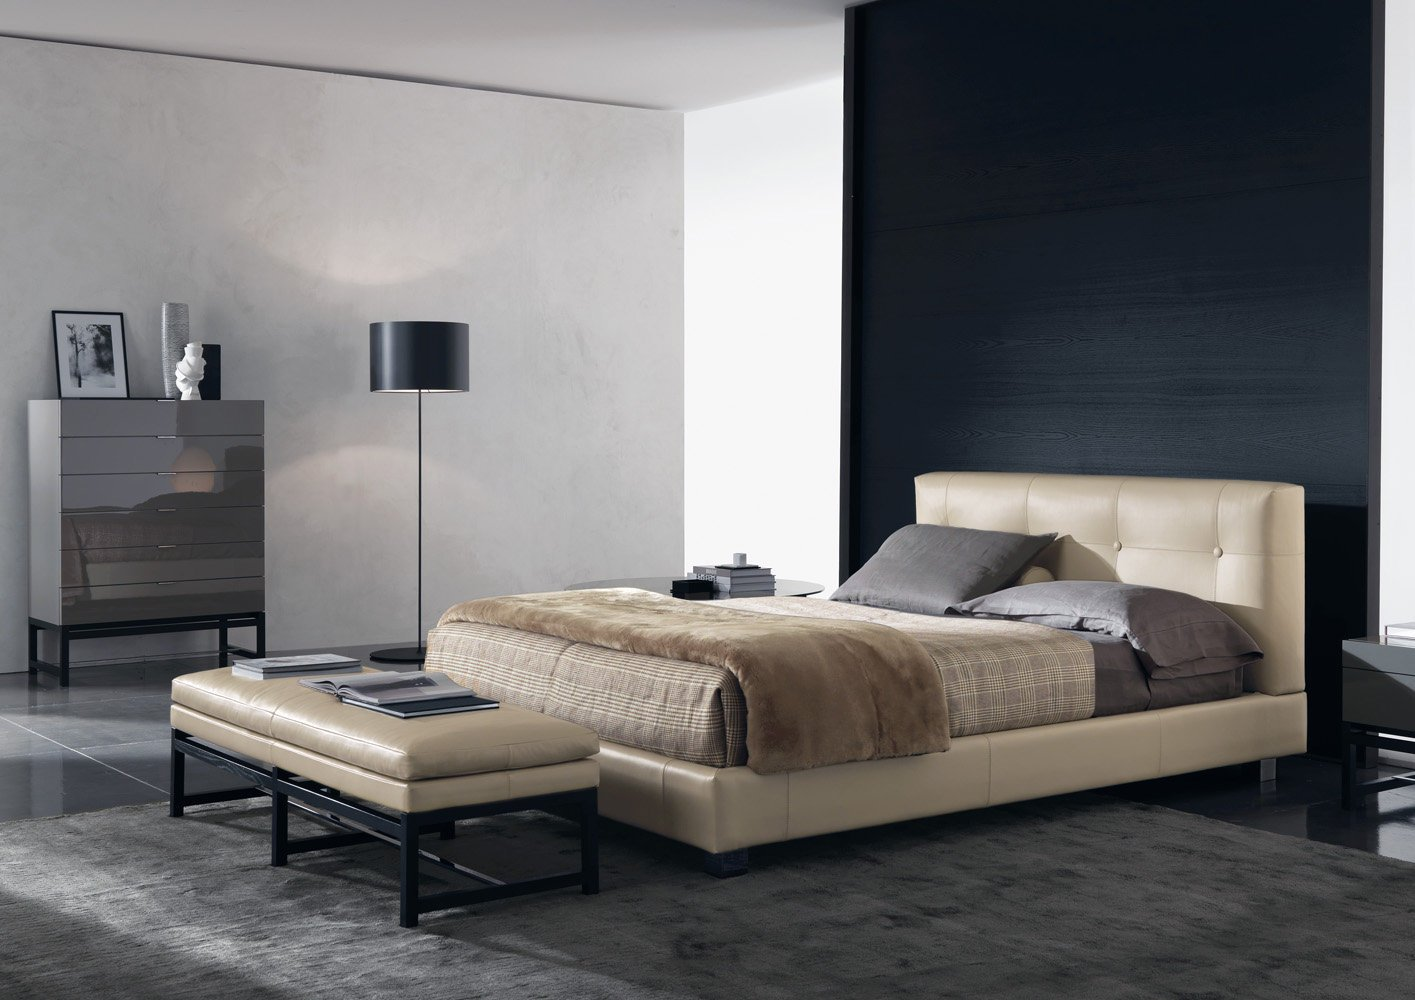 =VENUS訂製家具工廠=WEARING款式床架/訂製床架工廠/非Minotti,Rolf benz,Flou